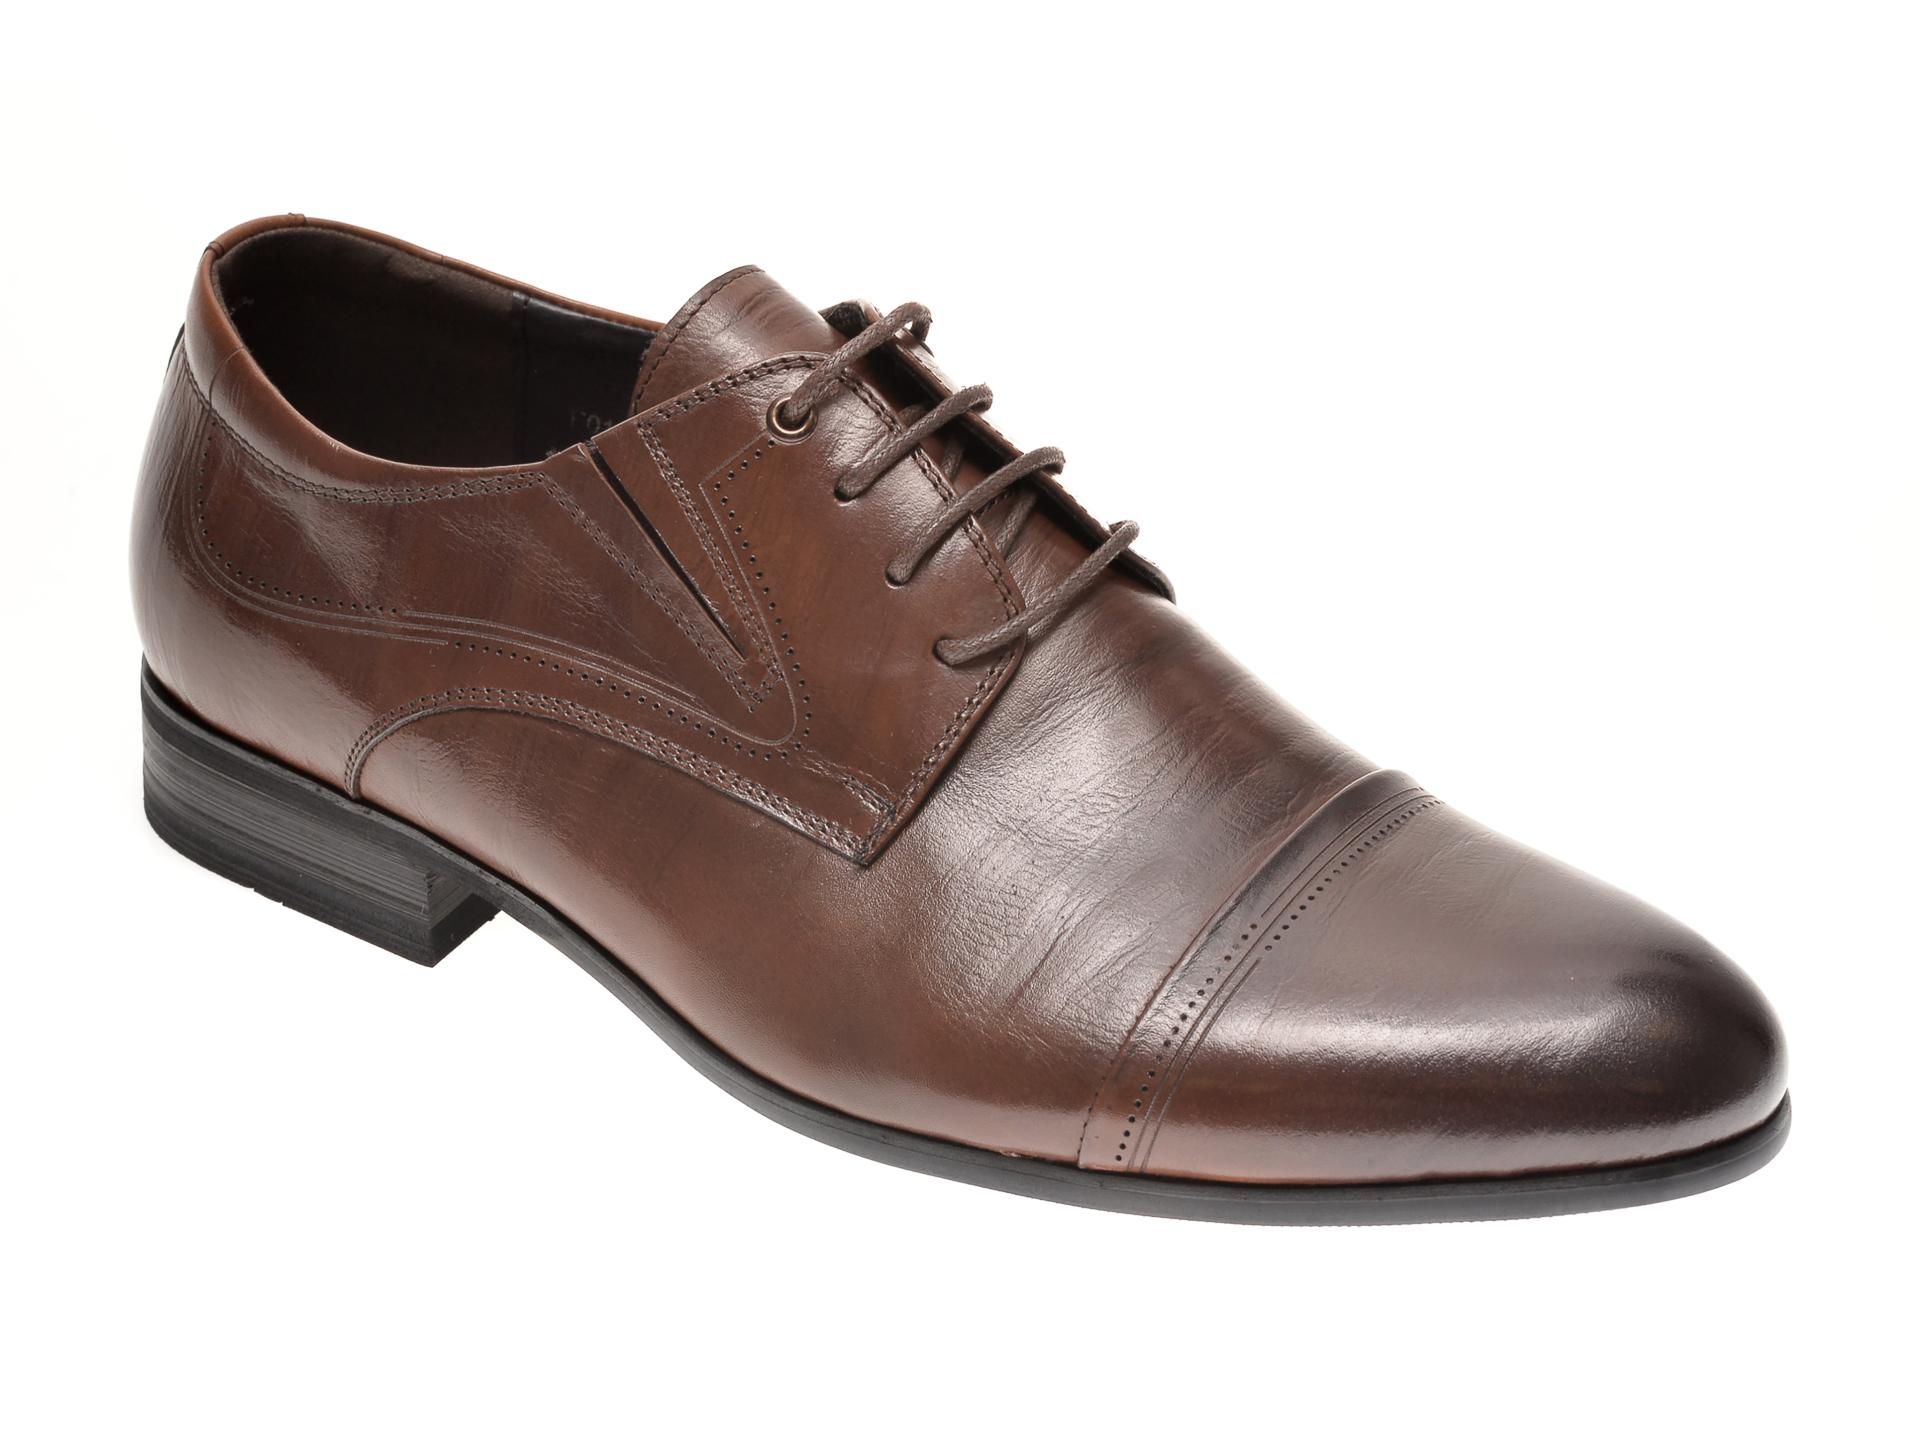 Pantofi OTTER maro, F01891, din piele naturala imagine